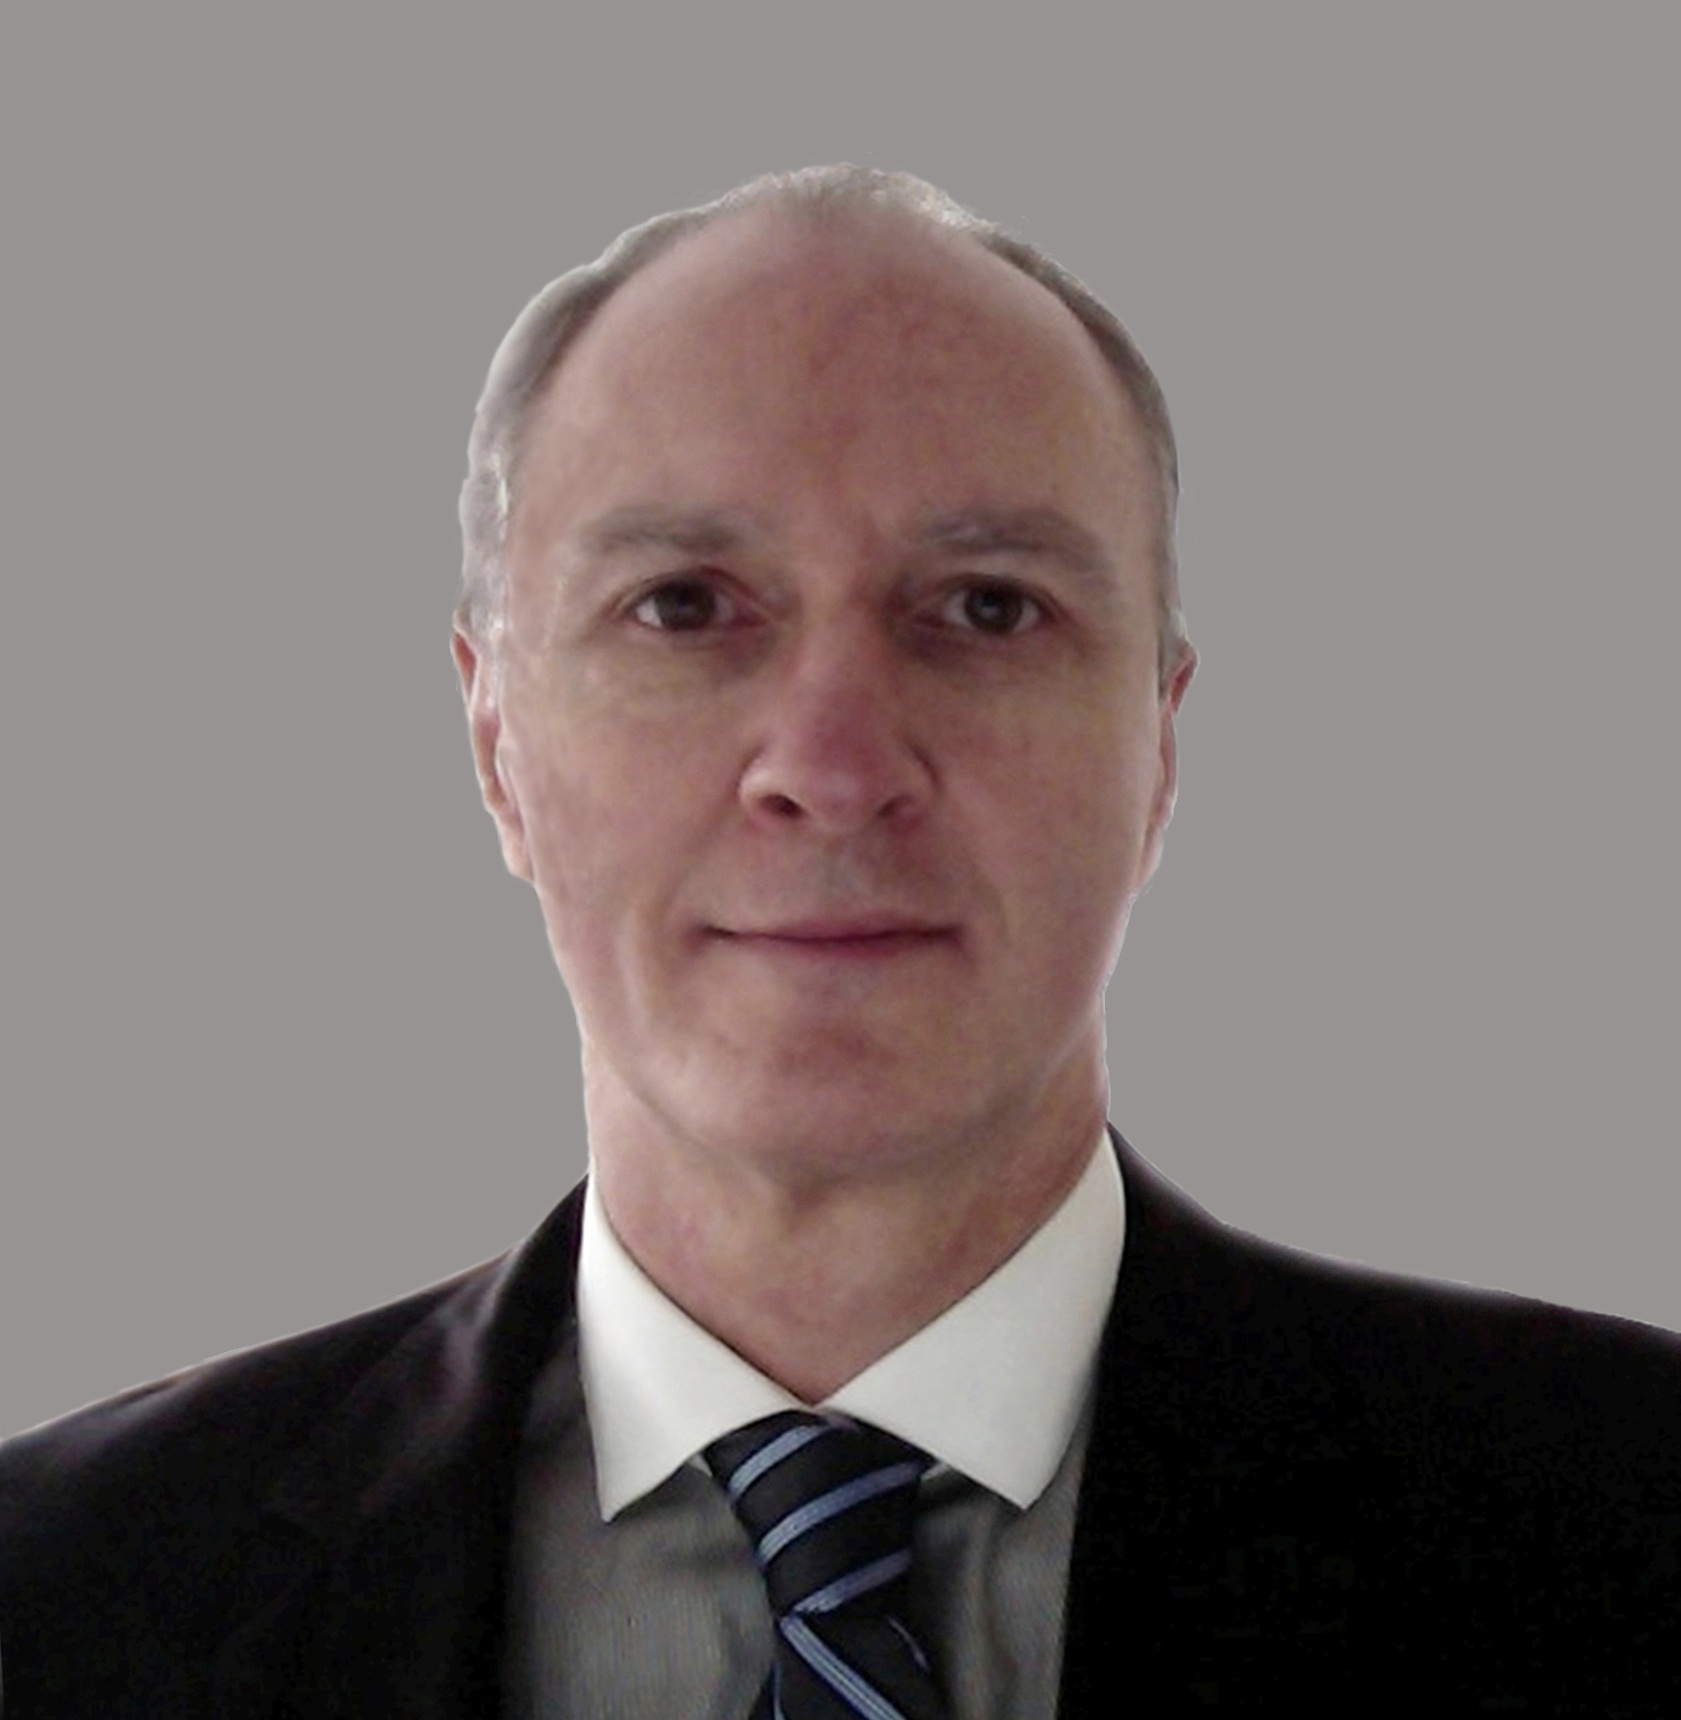 Denis Richard Jacobs